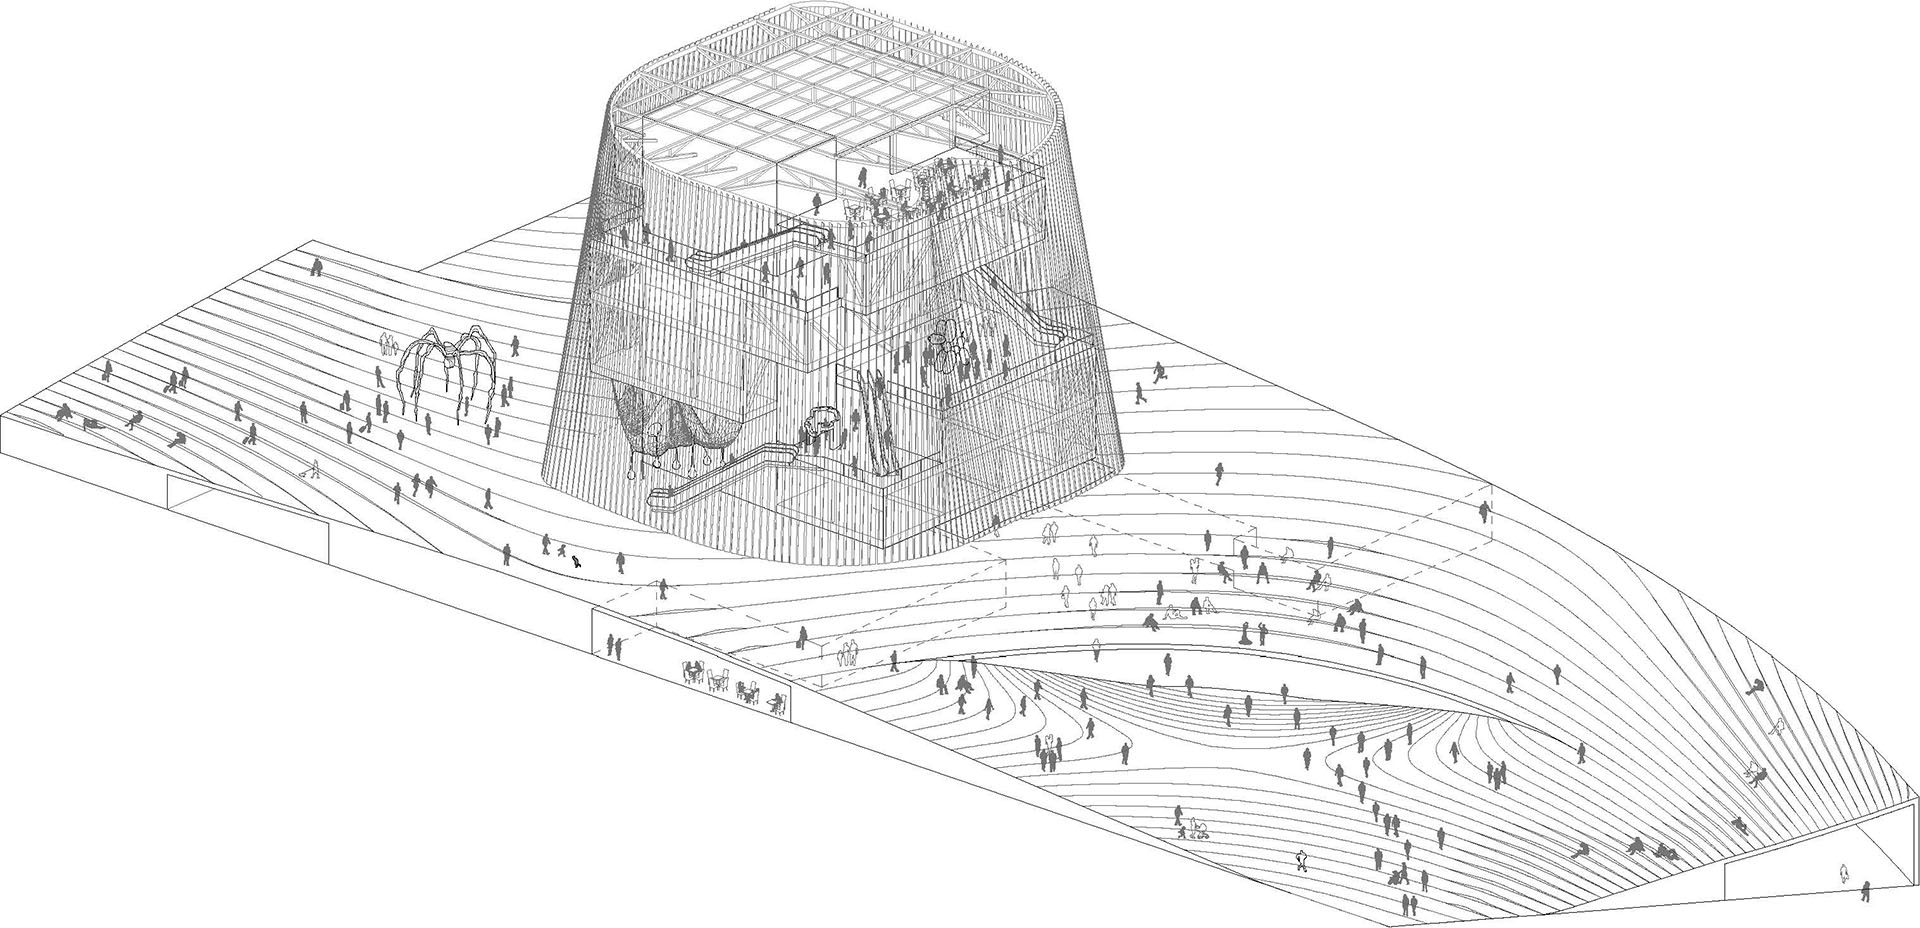 PLAYstudio_Guggenheim-Helsinki_Diagrama (4)